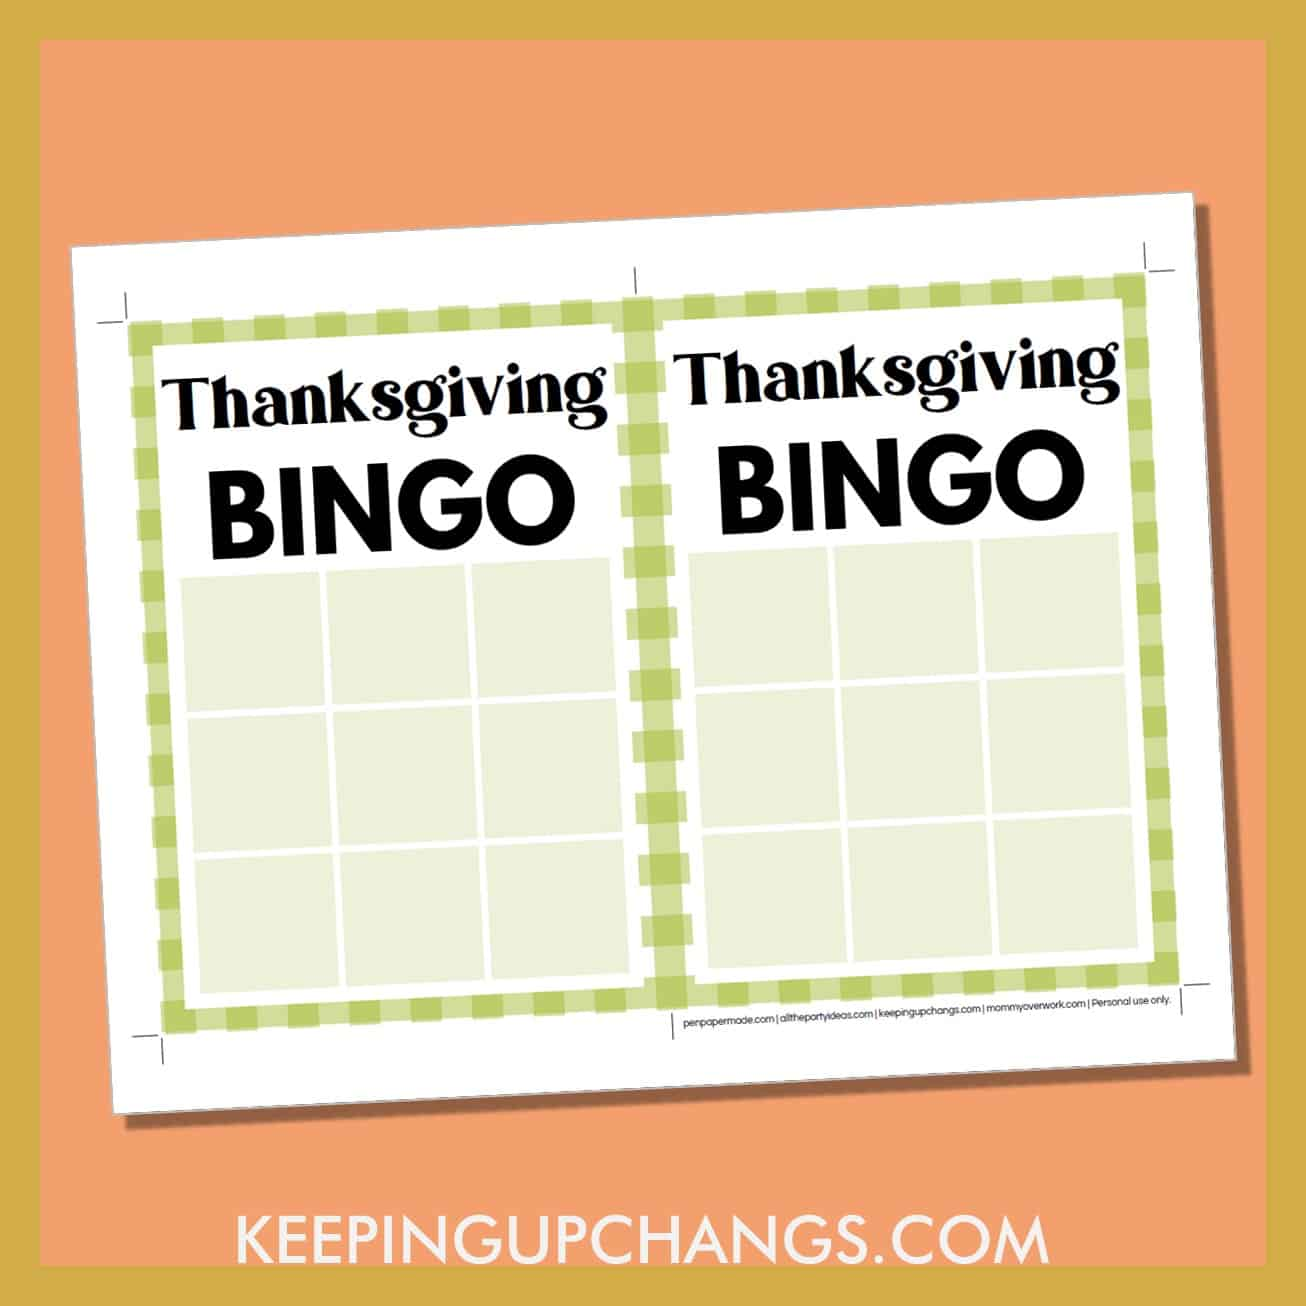 free thanksgiving bingo 3x3 grid game board blank template.